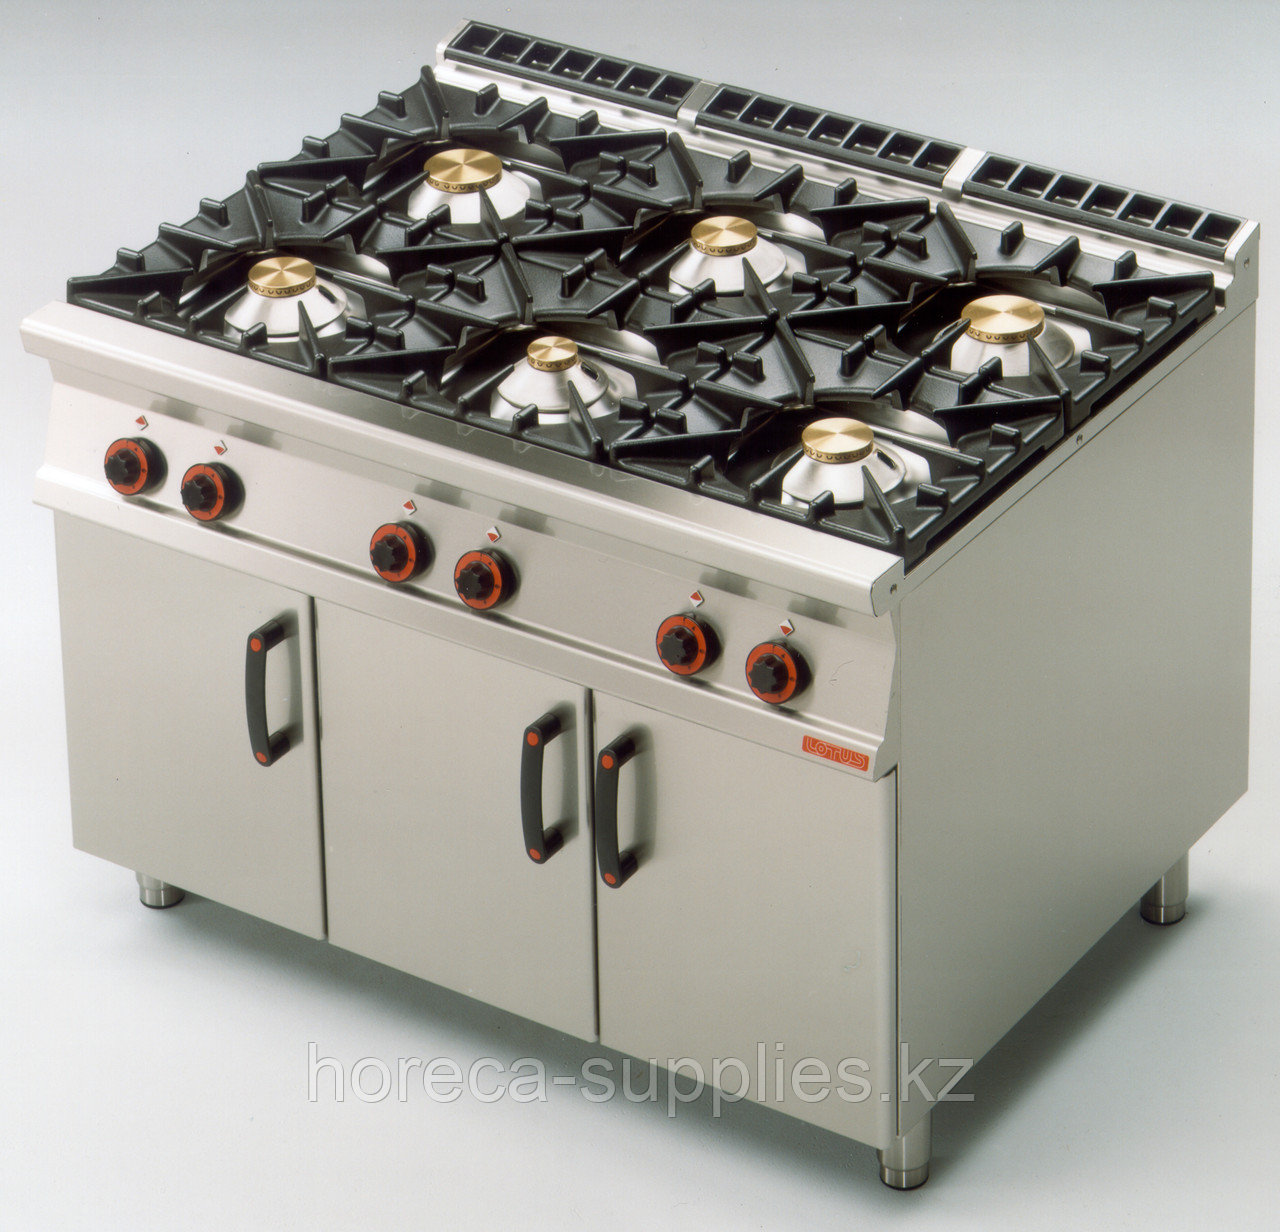 Плита газовая LOTUS PC-912G шестигорелочная без жарочного шкафа (серия 90)